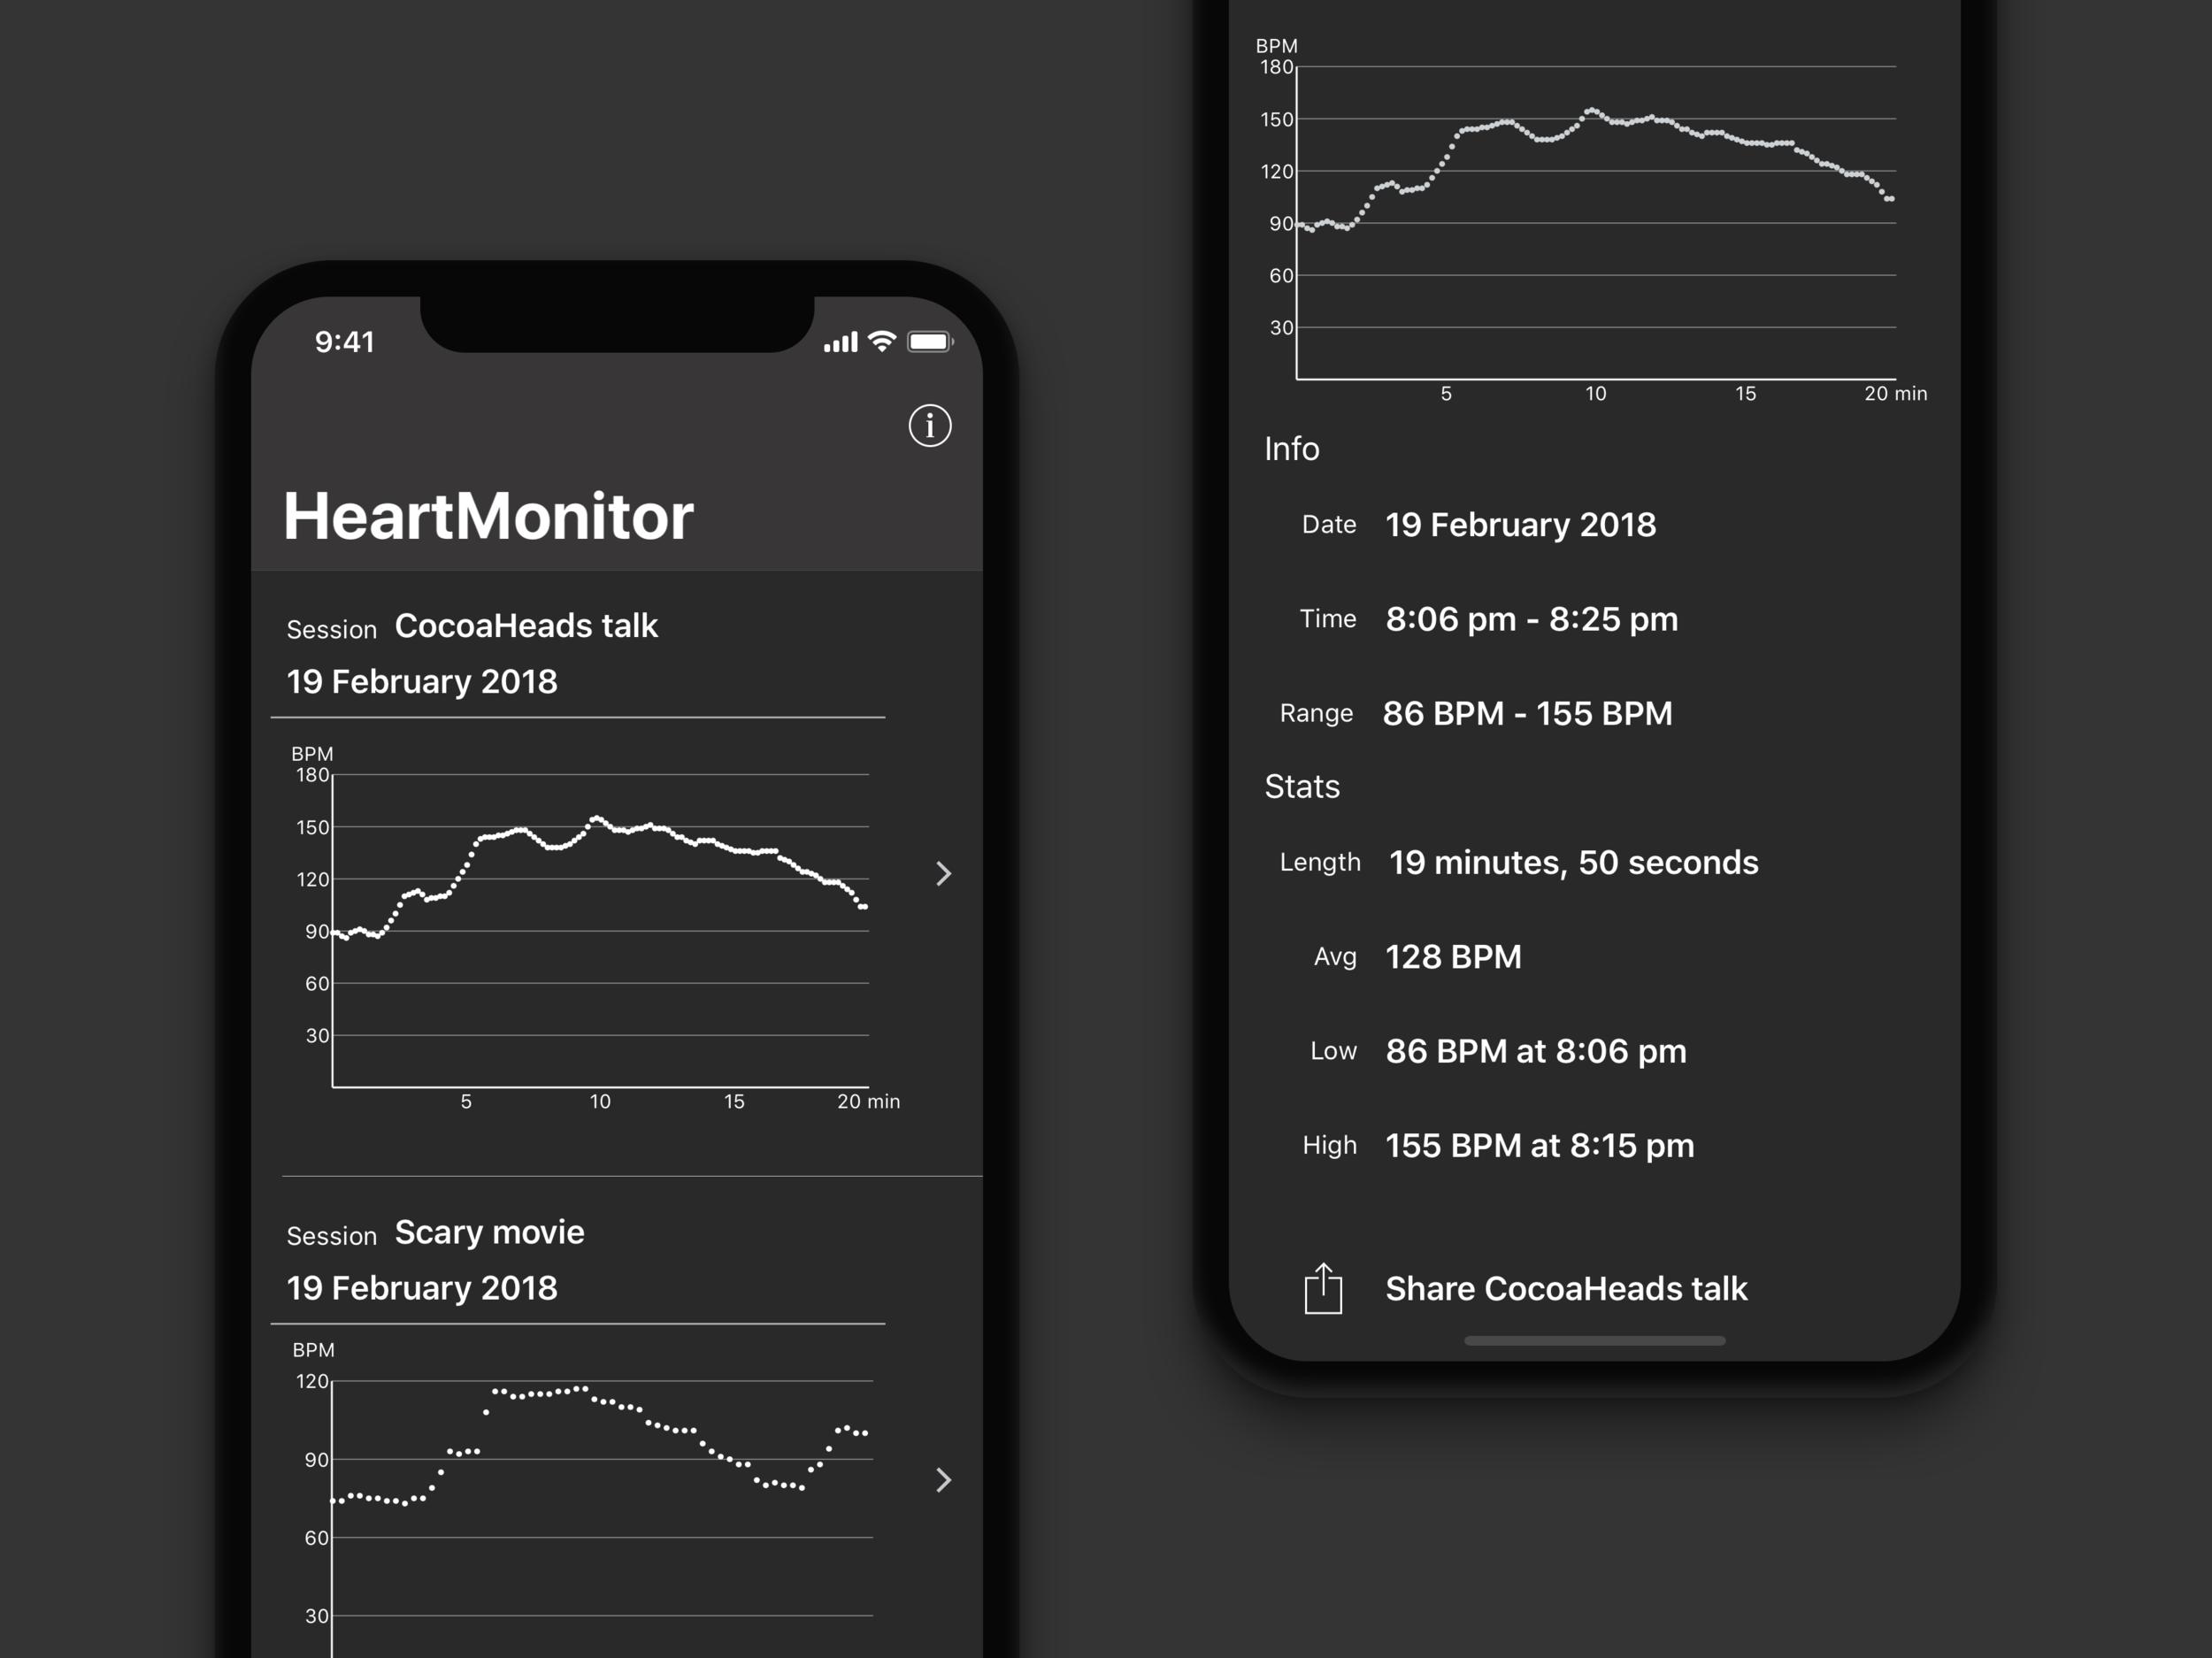 HeartMonitor_Marketing_1.png